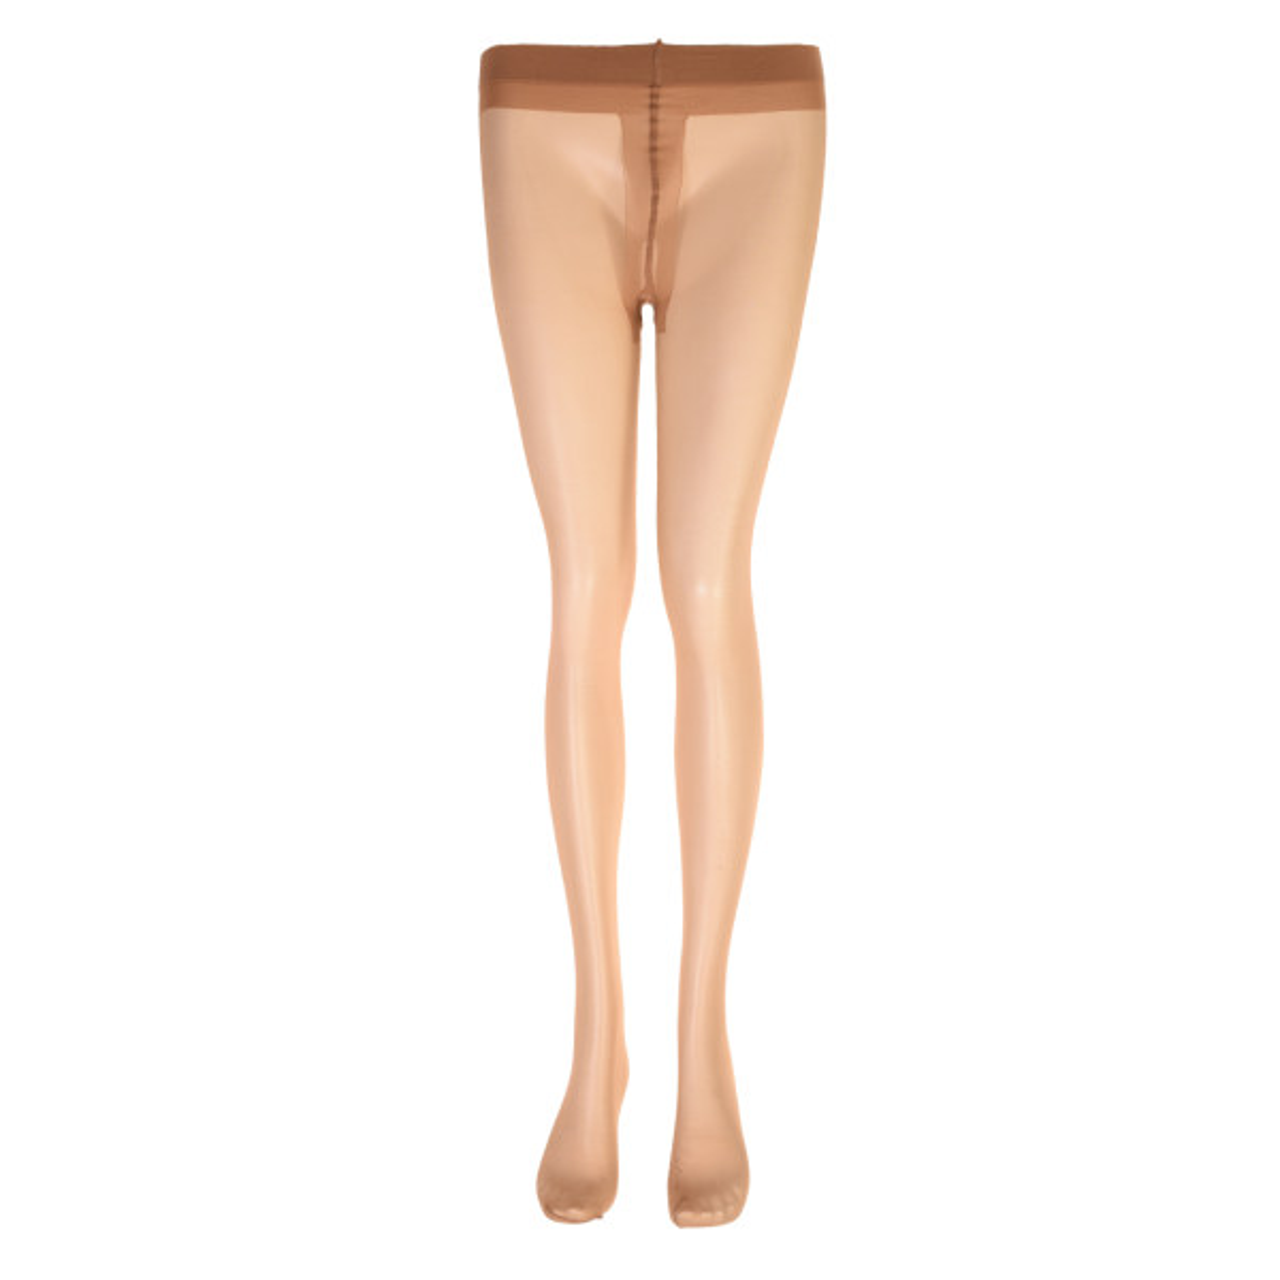 جوراب شلواری زنانه مو مدل 5054367